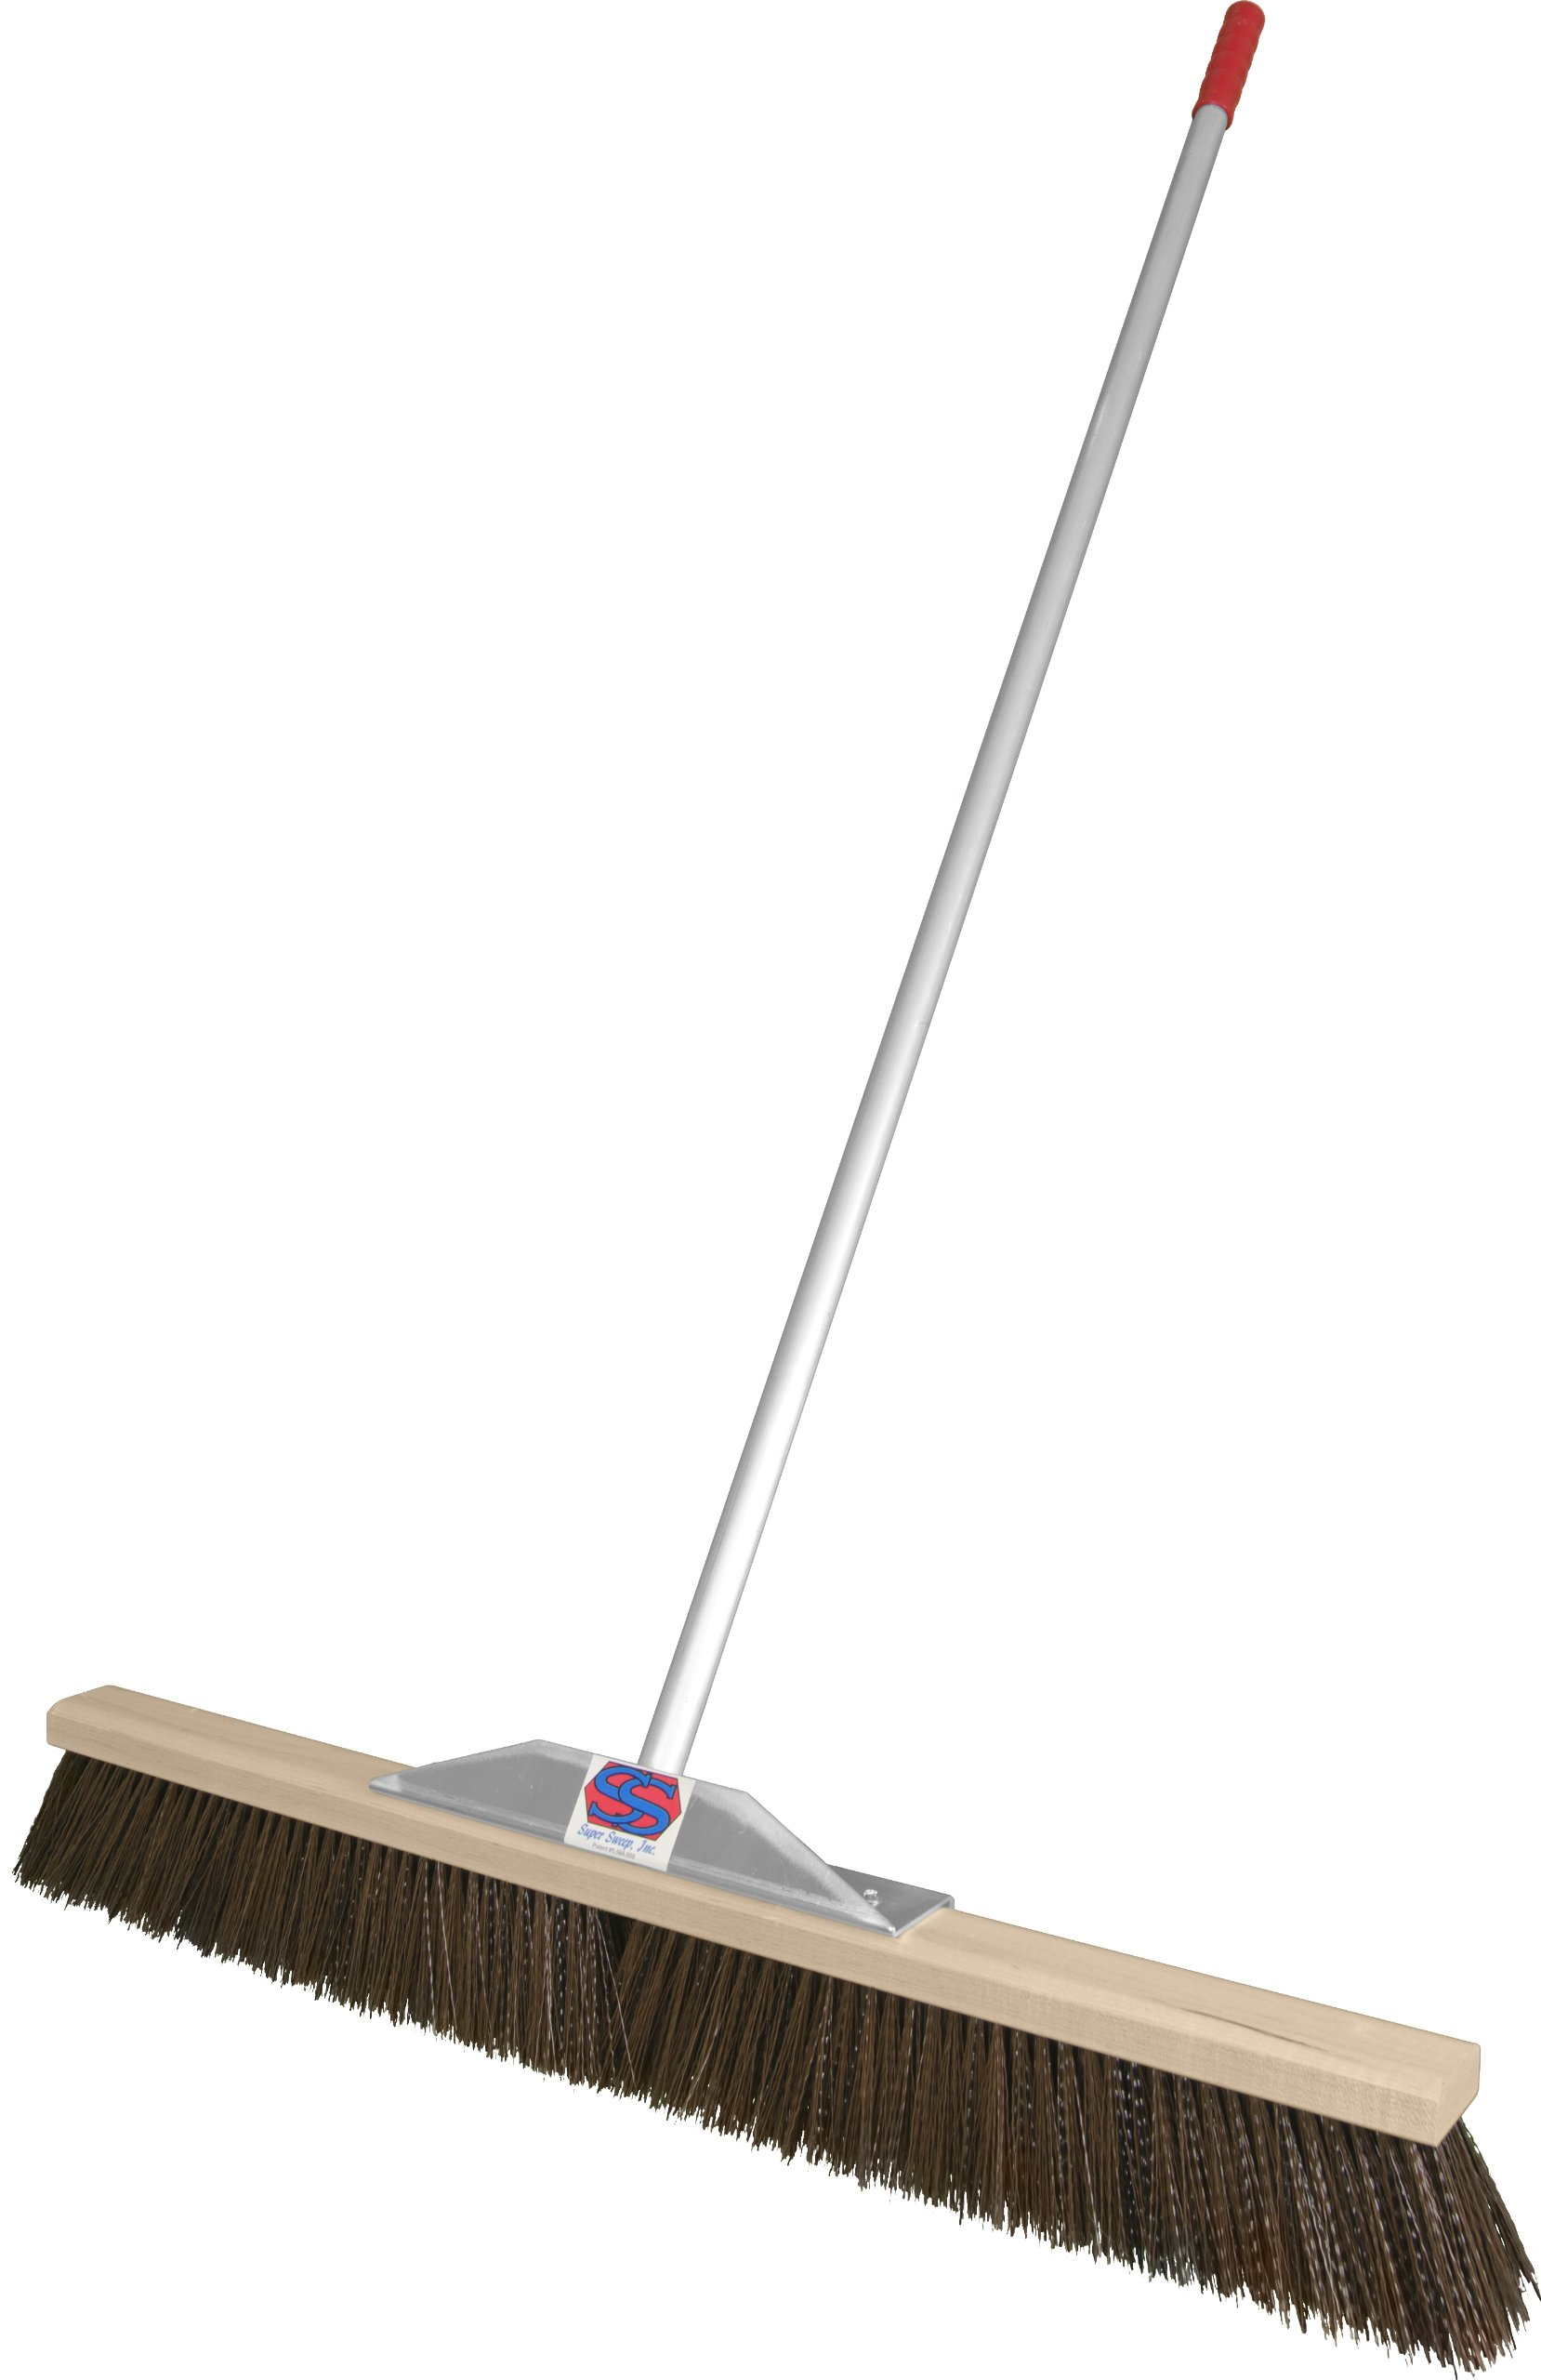 Super Sweep 36-Inch Palmyra Poly Broom by Super Sweep Inc.